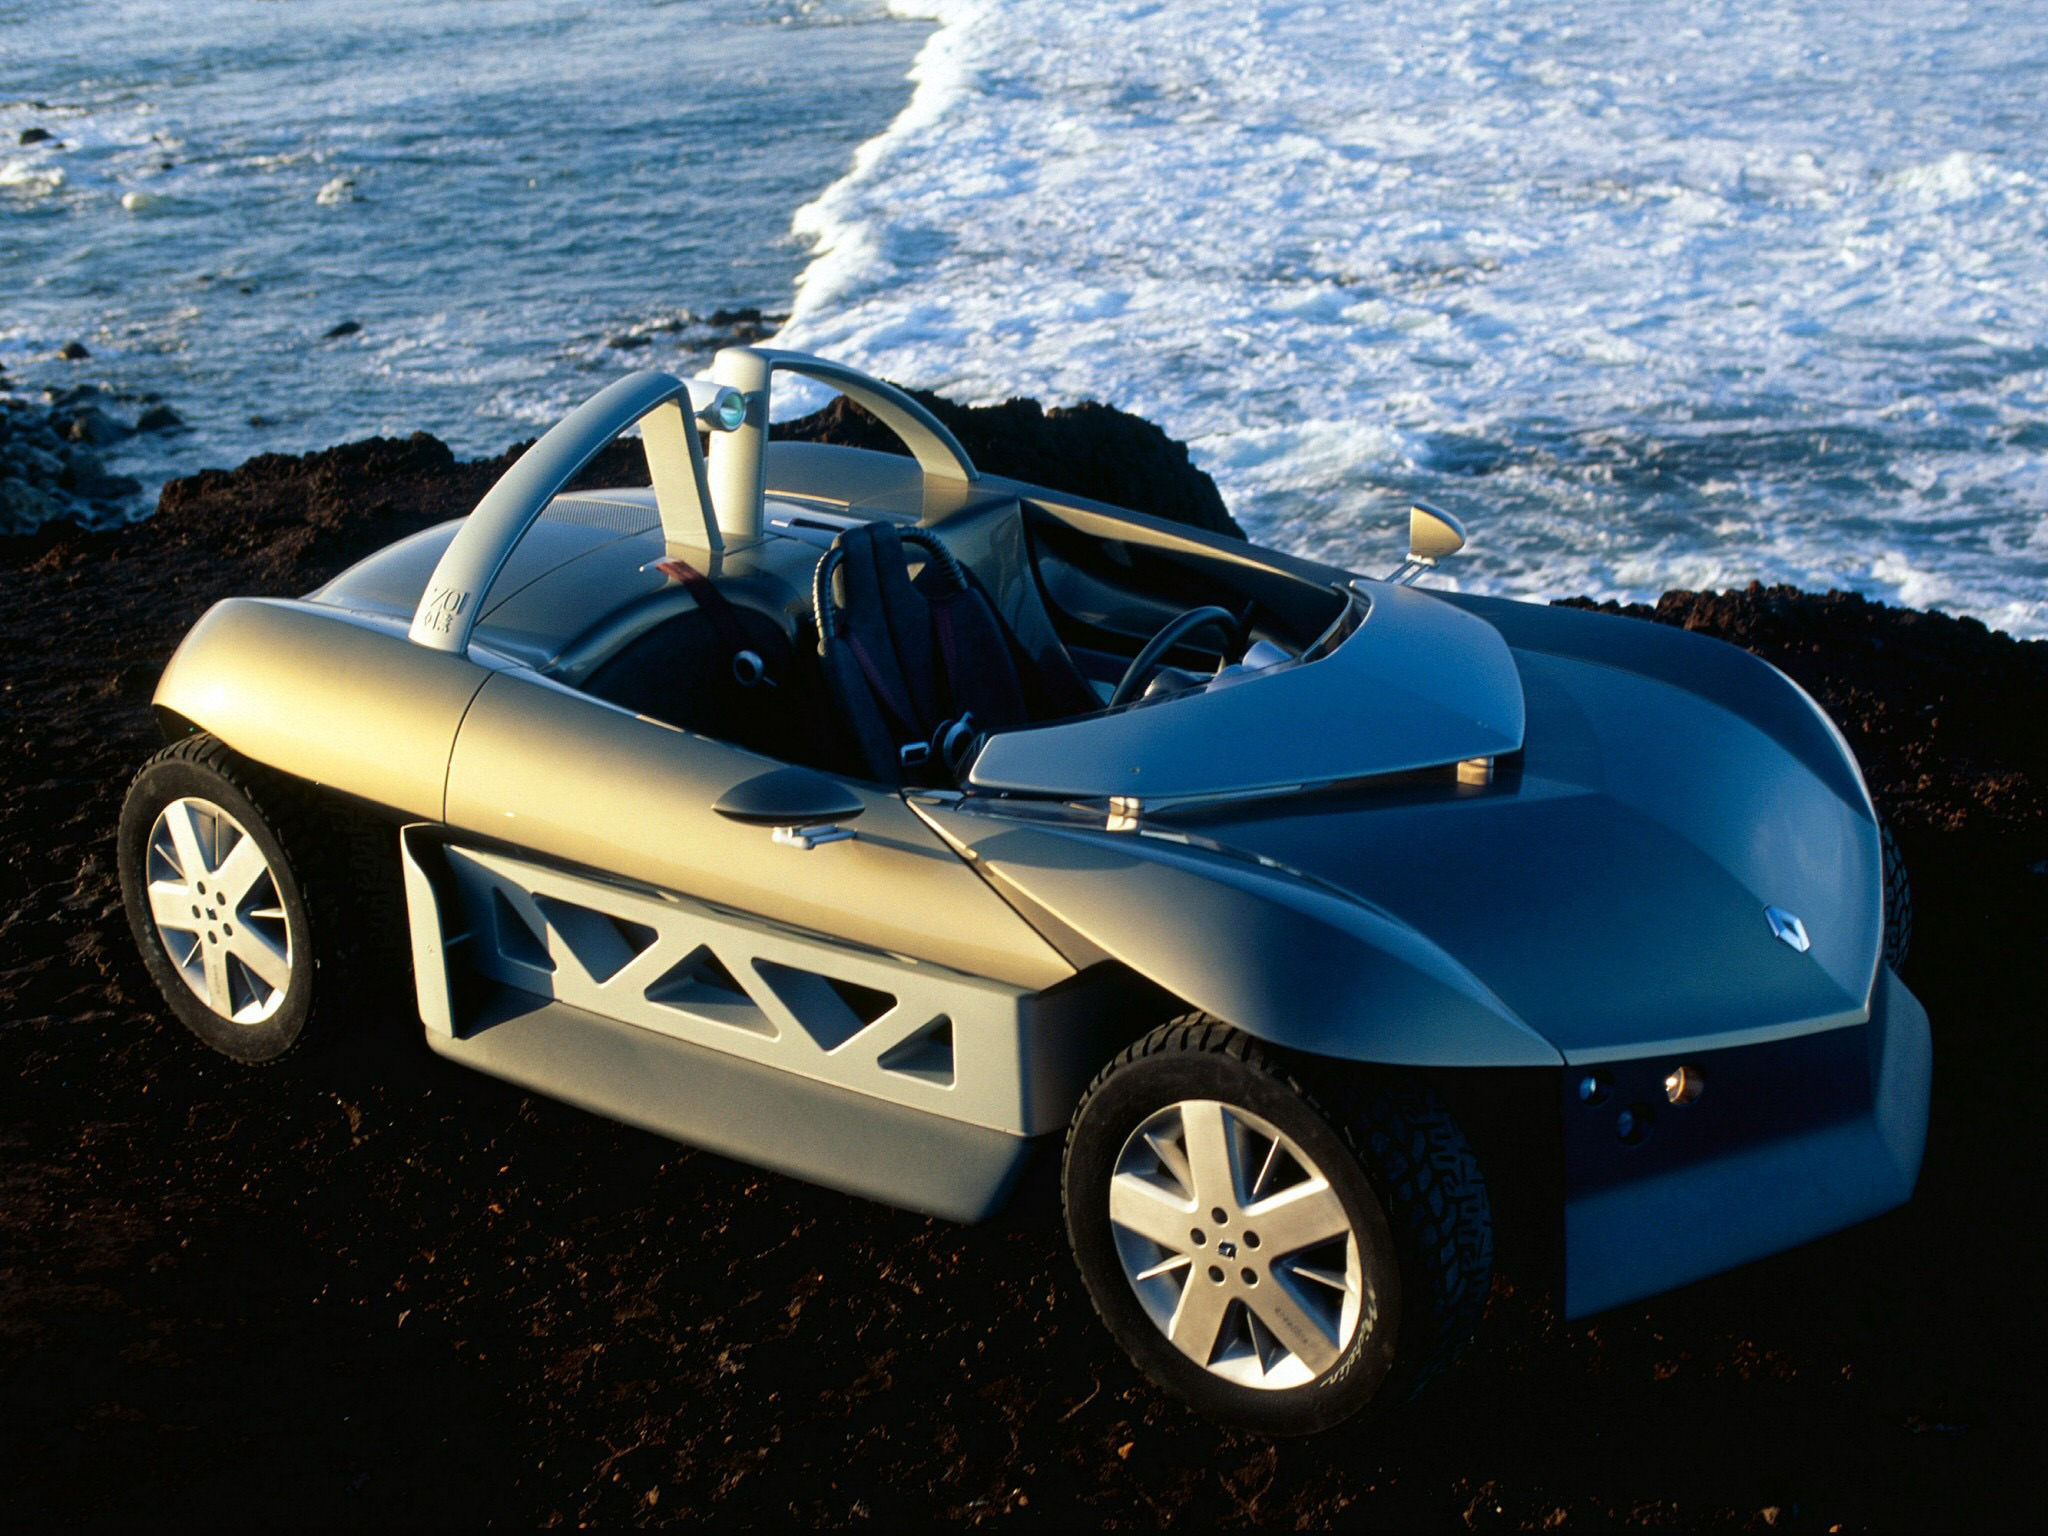 renault zo concept 1998 old concept cars. Black Bedroom Furniture Sets. Home Design Ideas